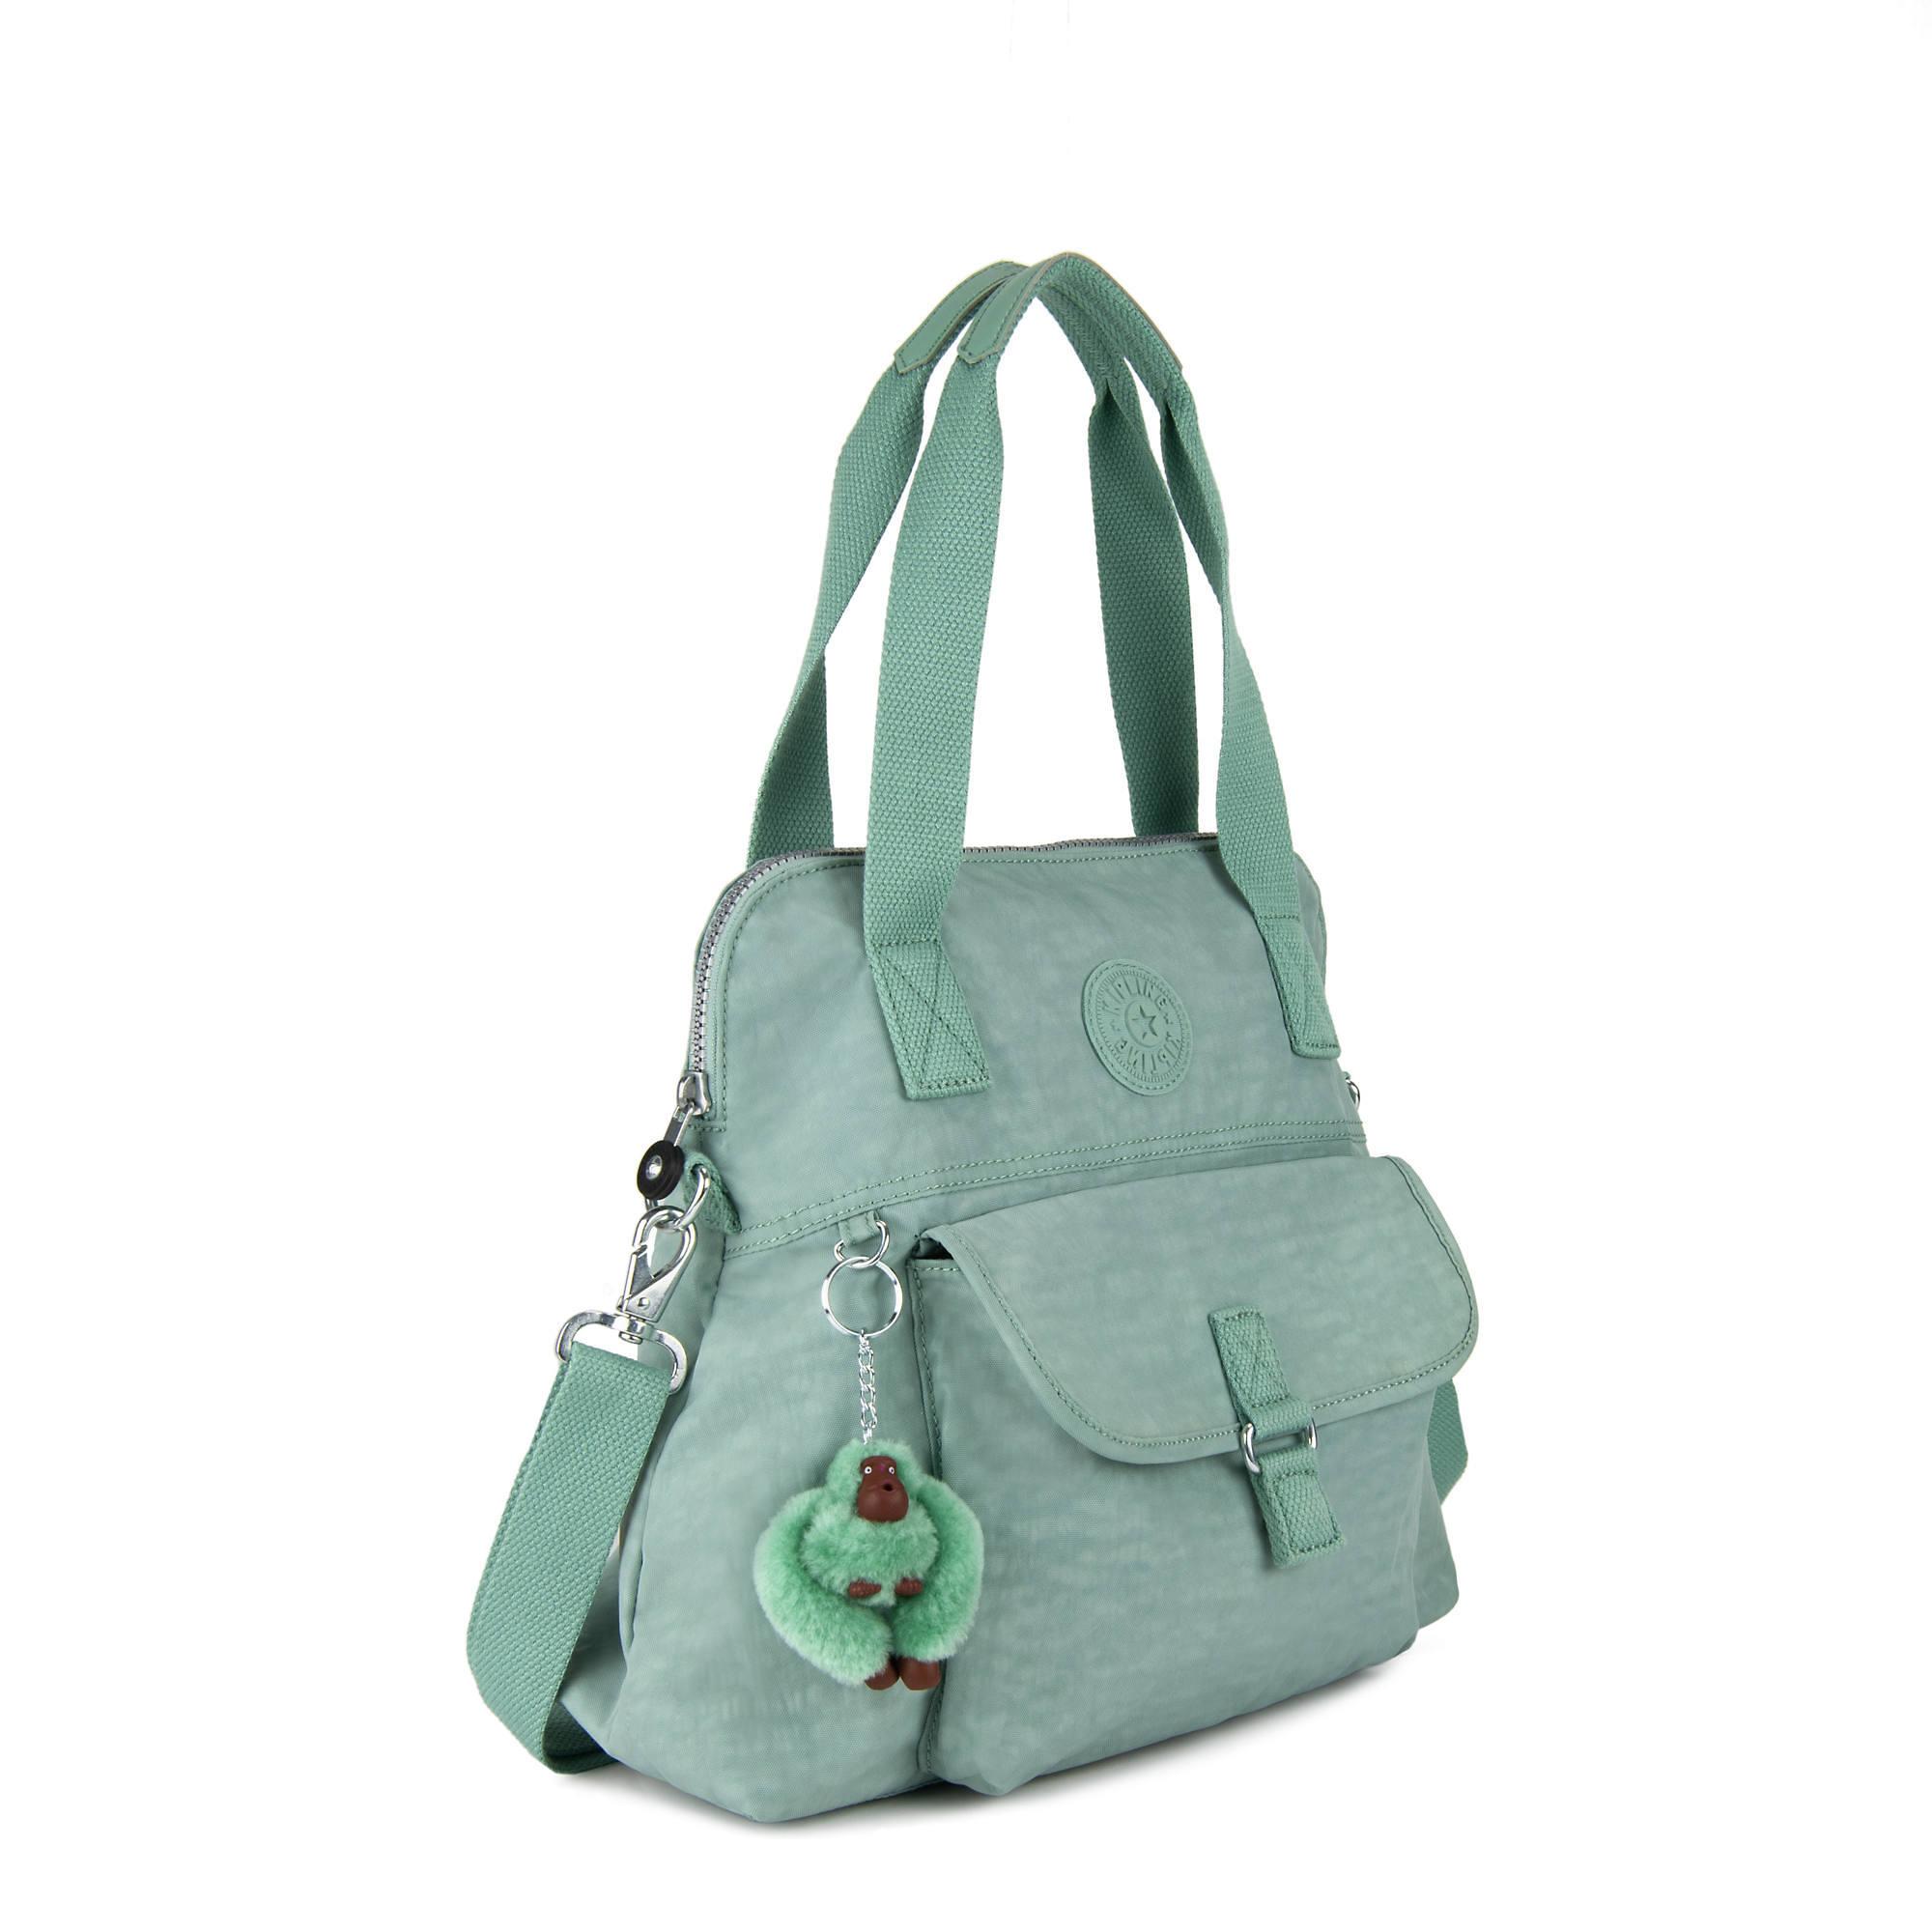 aaa1faf15f Kipling-Pahneiro-Handbag thumbnail 14